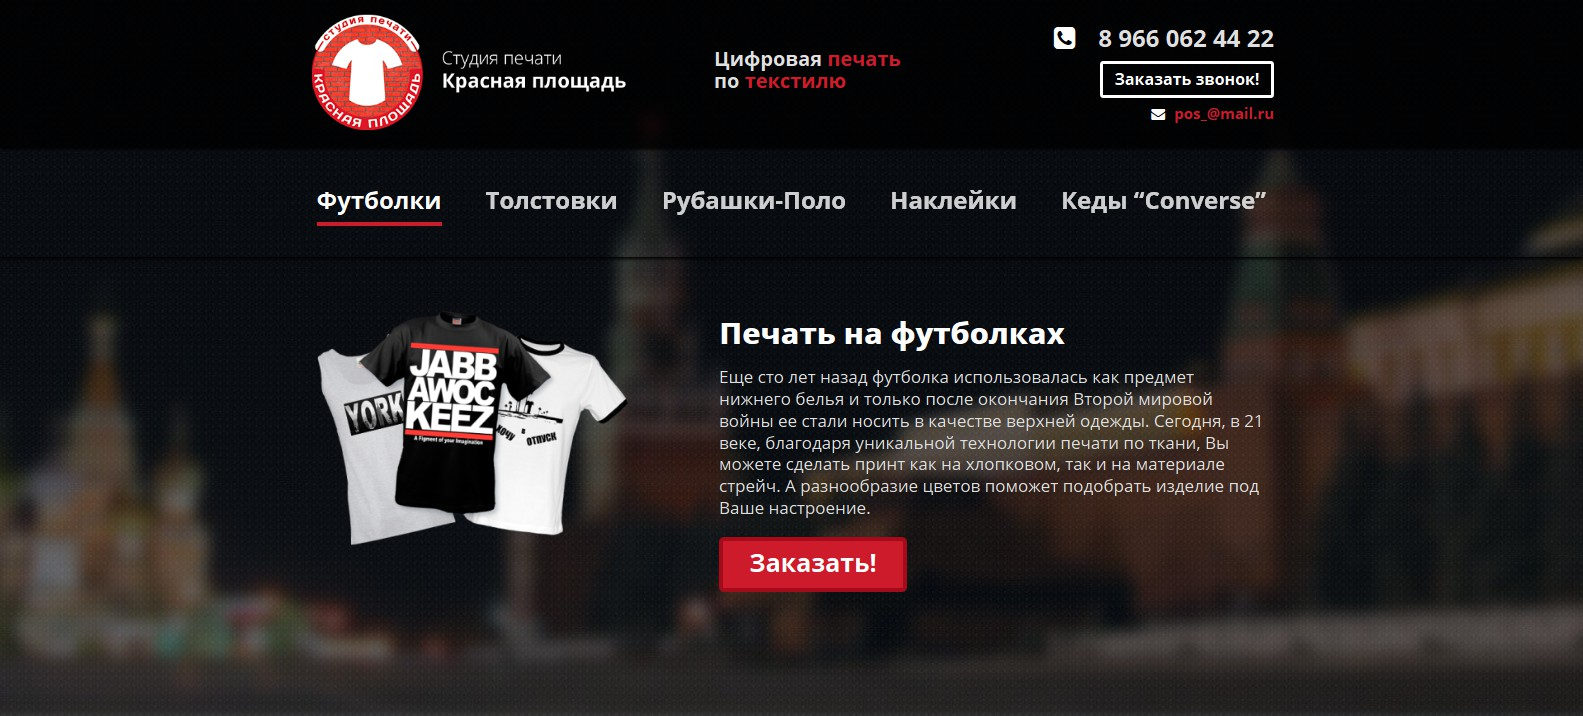 Красная Площадь (Landing Page)